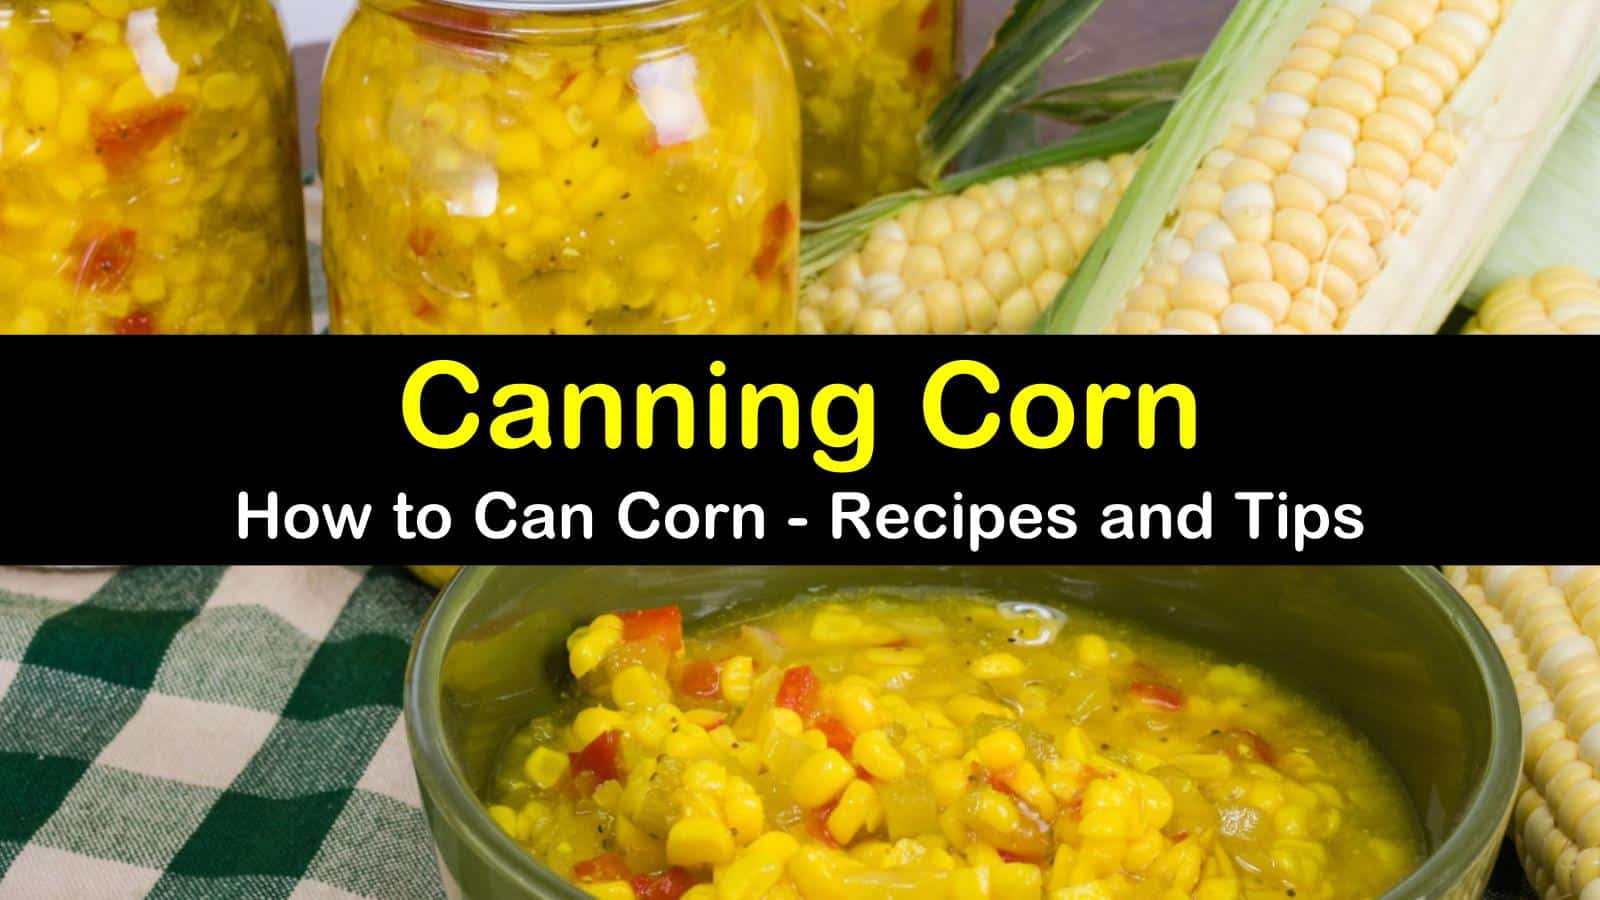 canning corn titleimg1